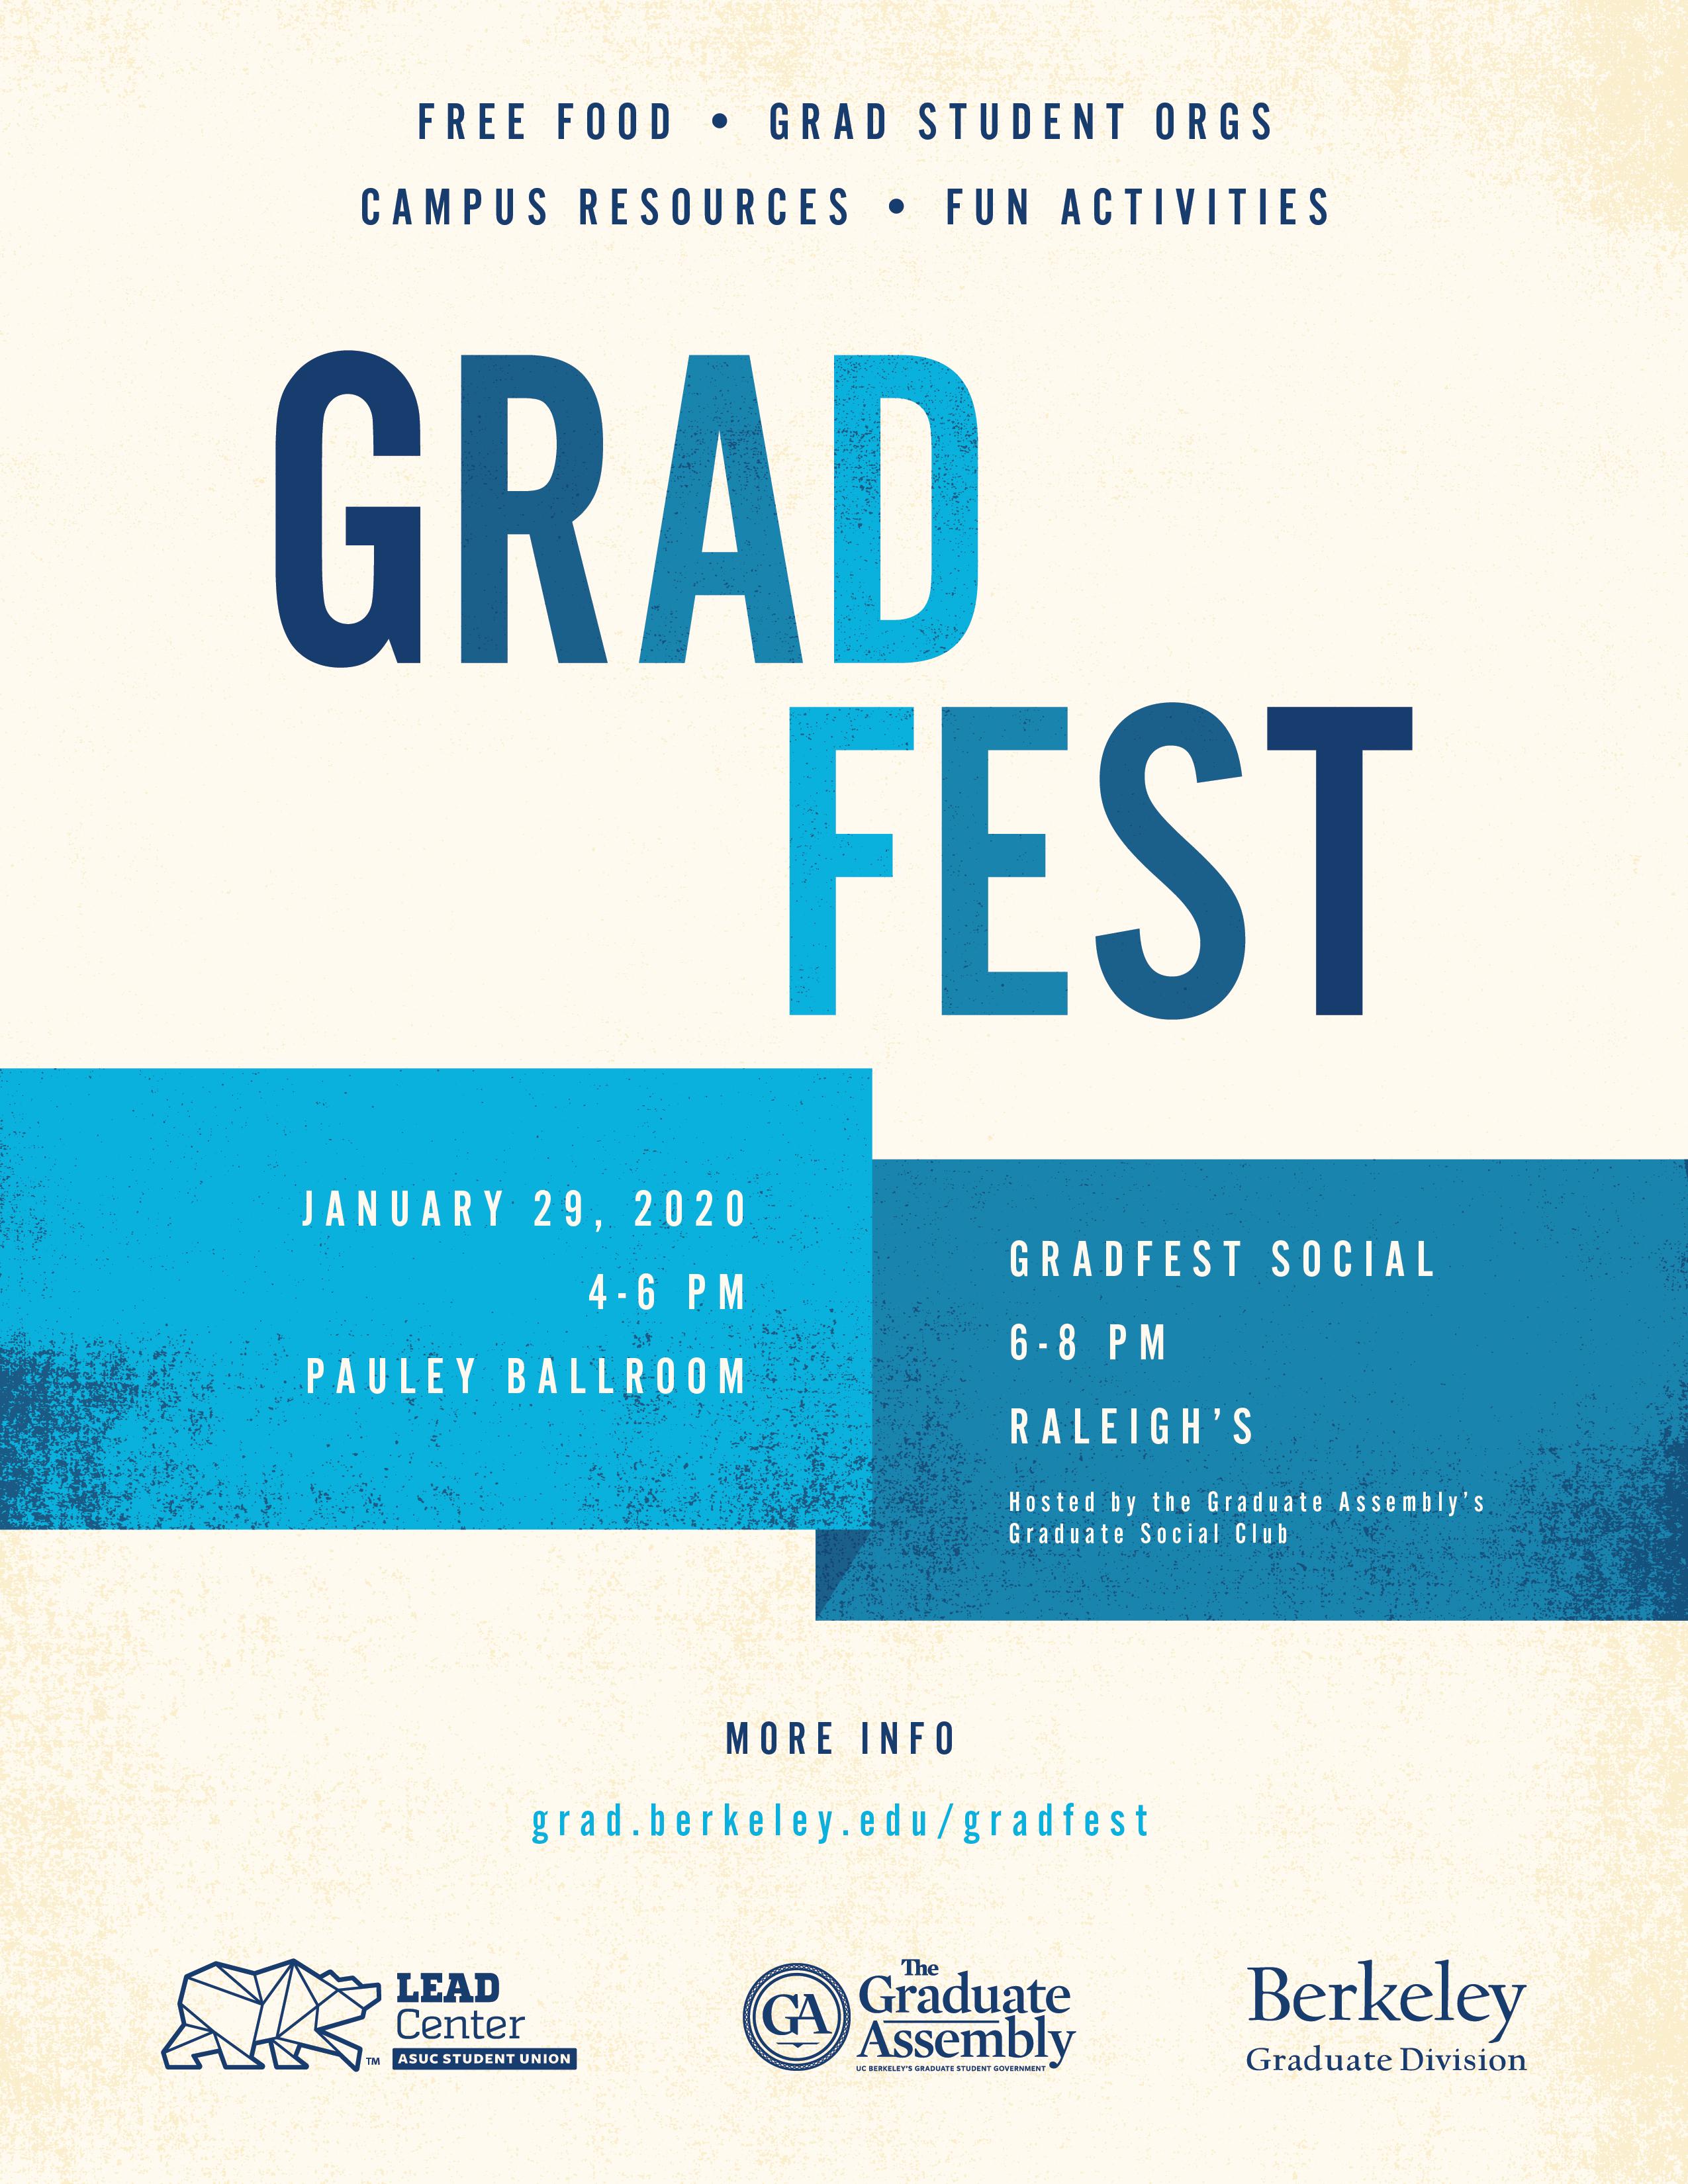 Spring 2020 Gradfest | Berkeley Graduate Division regarding Berkeley Academic Calendar 2020